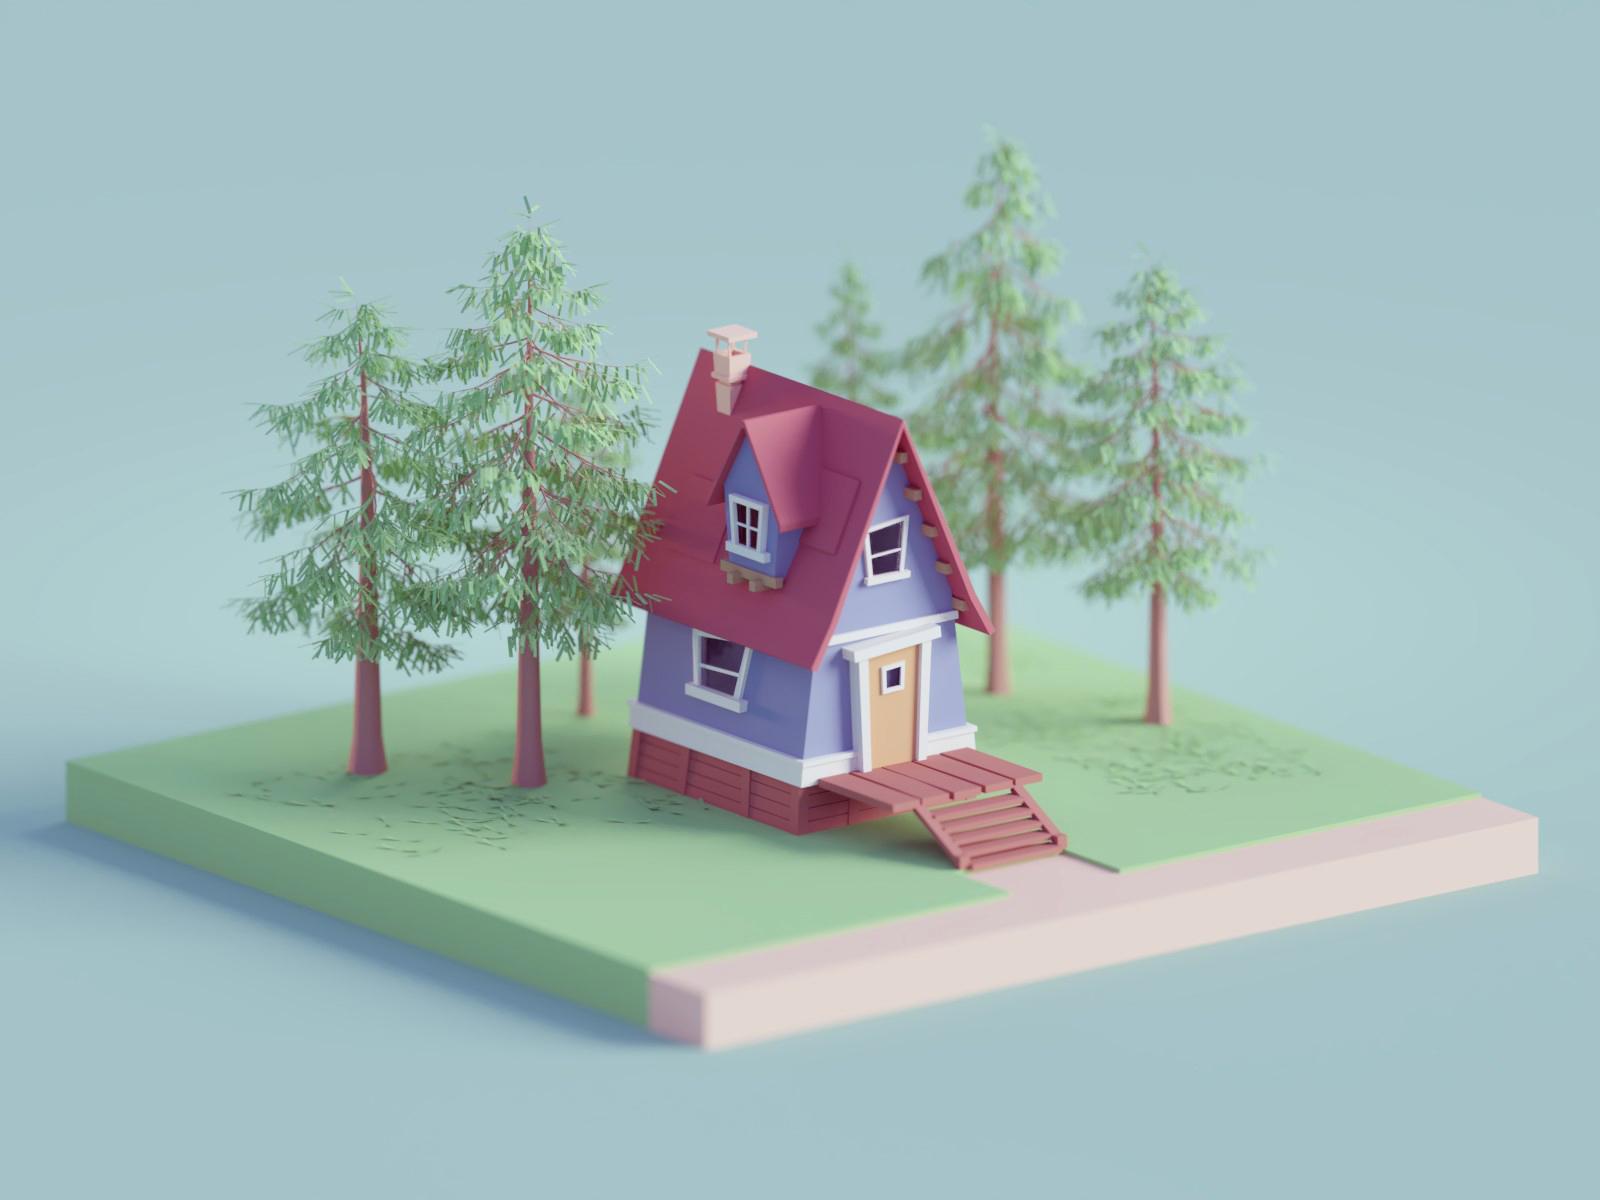 Random renders colors subtle house trees low poly b3d isometric blender